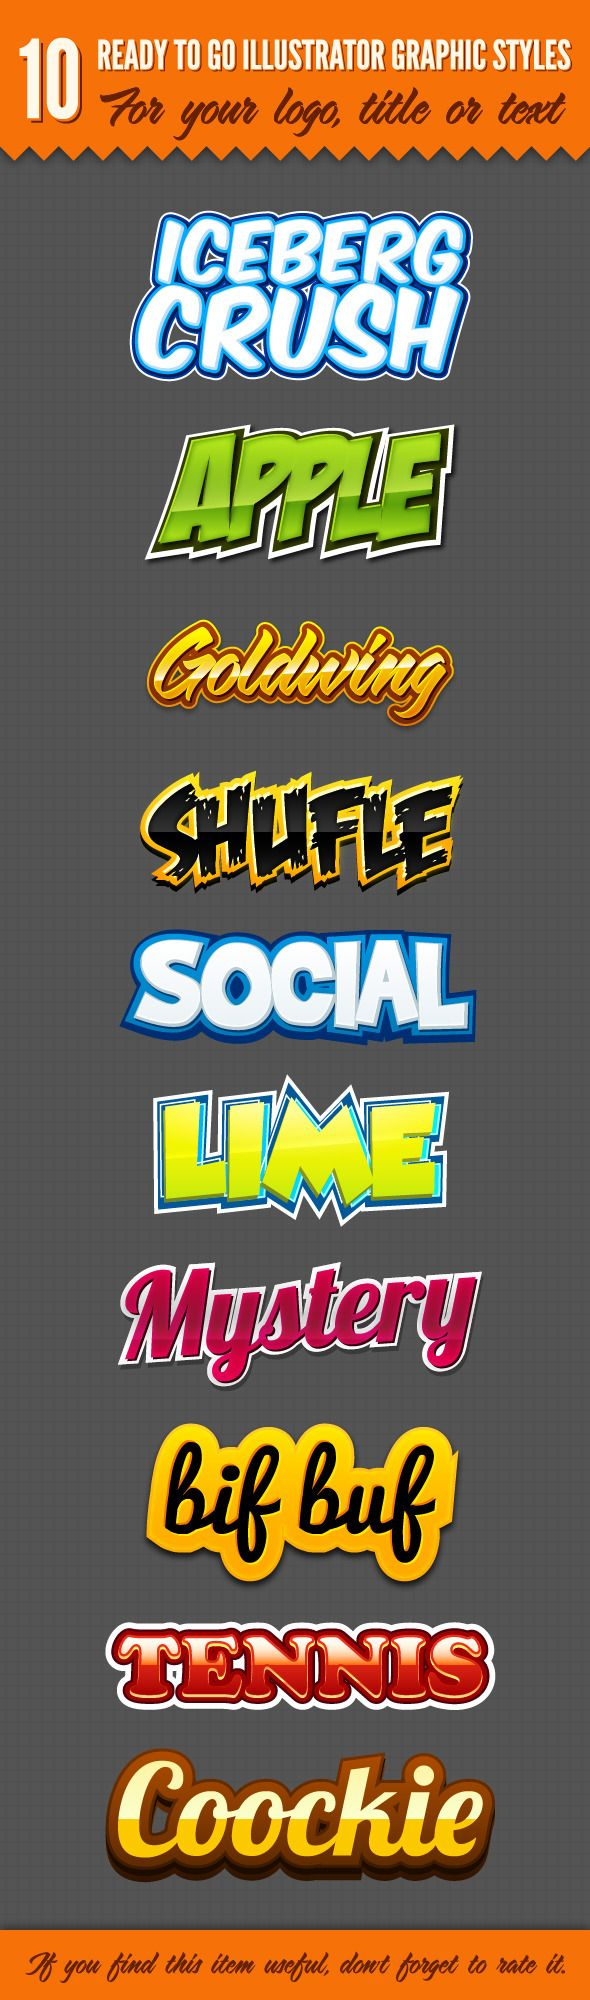 10 Logo Graphic Styles for Adobe Illustrator #design #ai Download: http://graphicriver.net/item/10-logo-graphic-styles/3417872?ref=ksioks